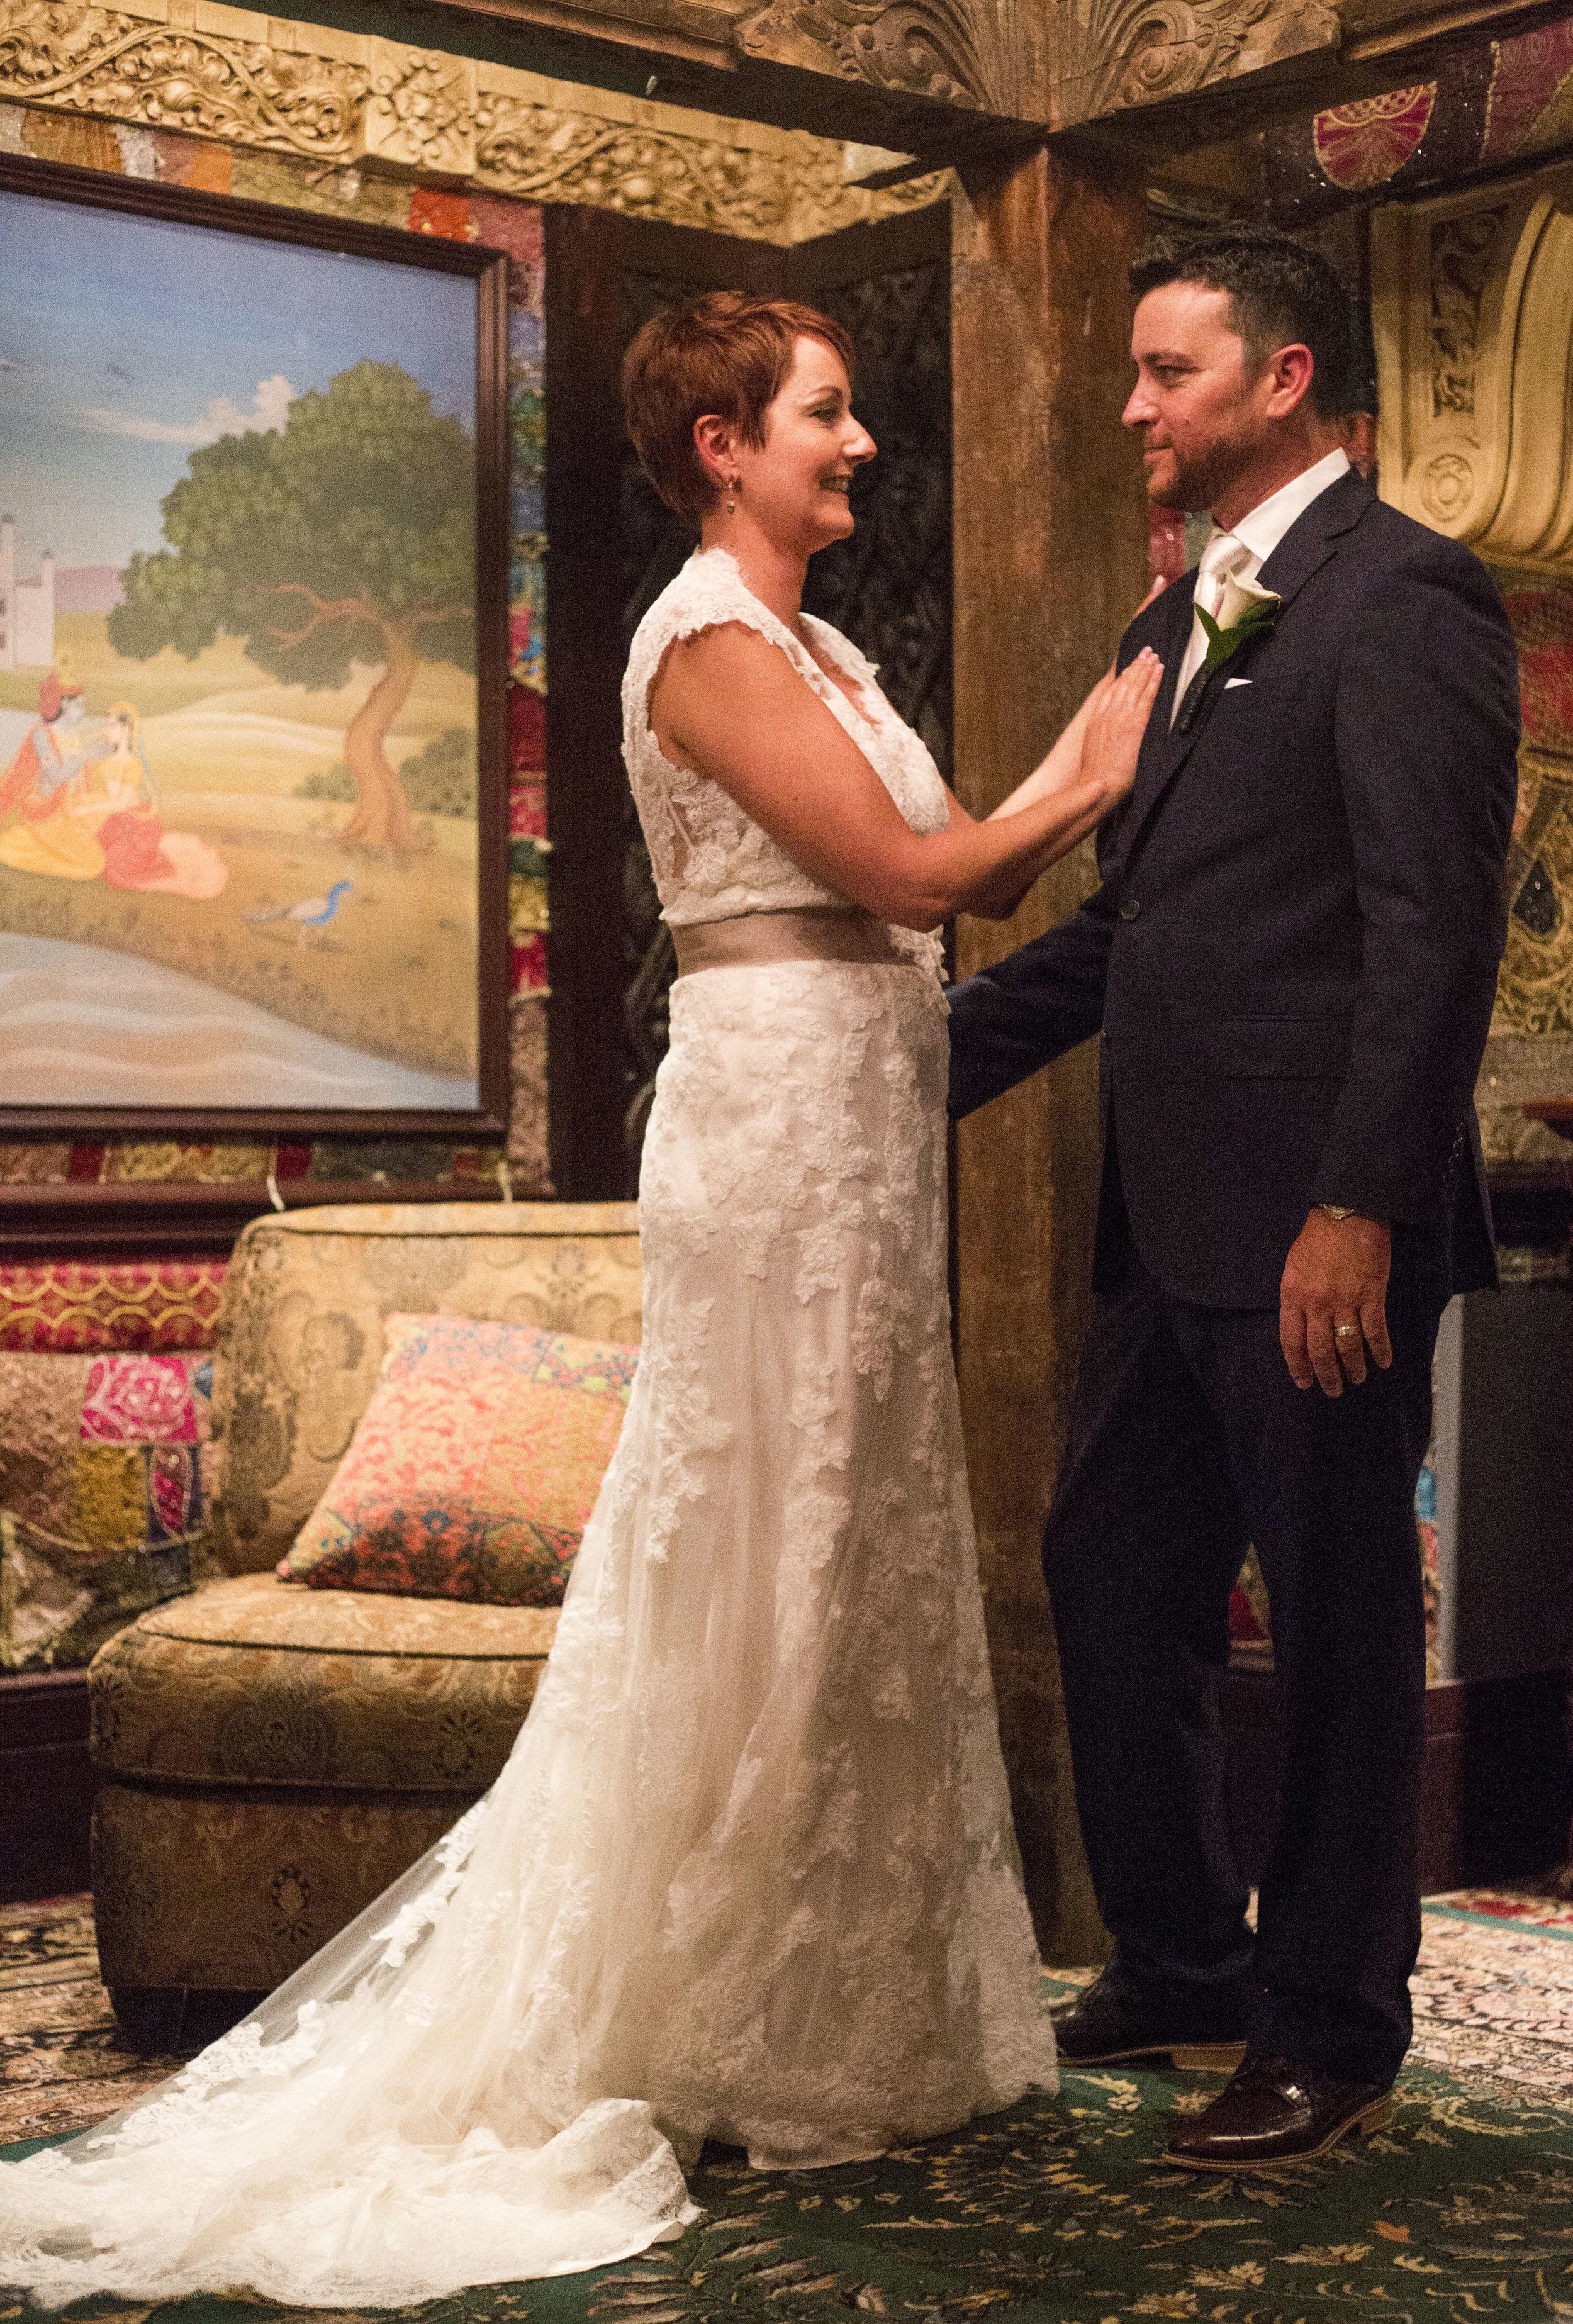 ATGI_Kat and Gabe Wedding 2016_2S8A5409.jpg